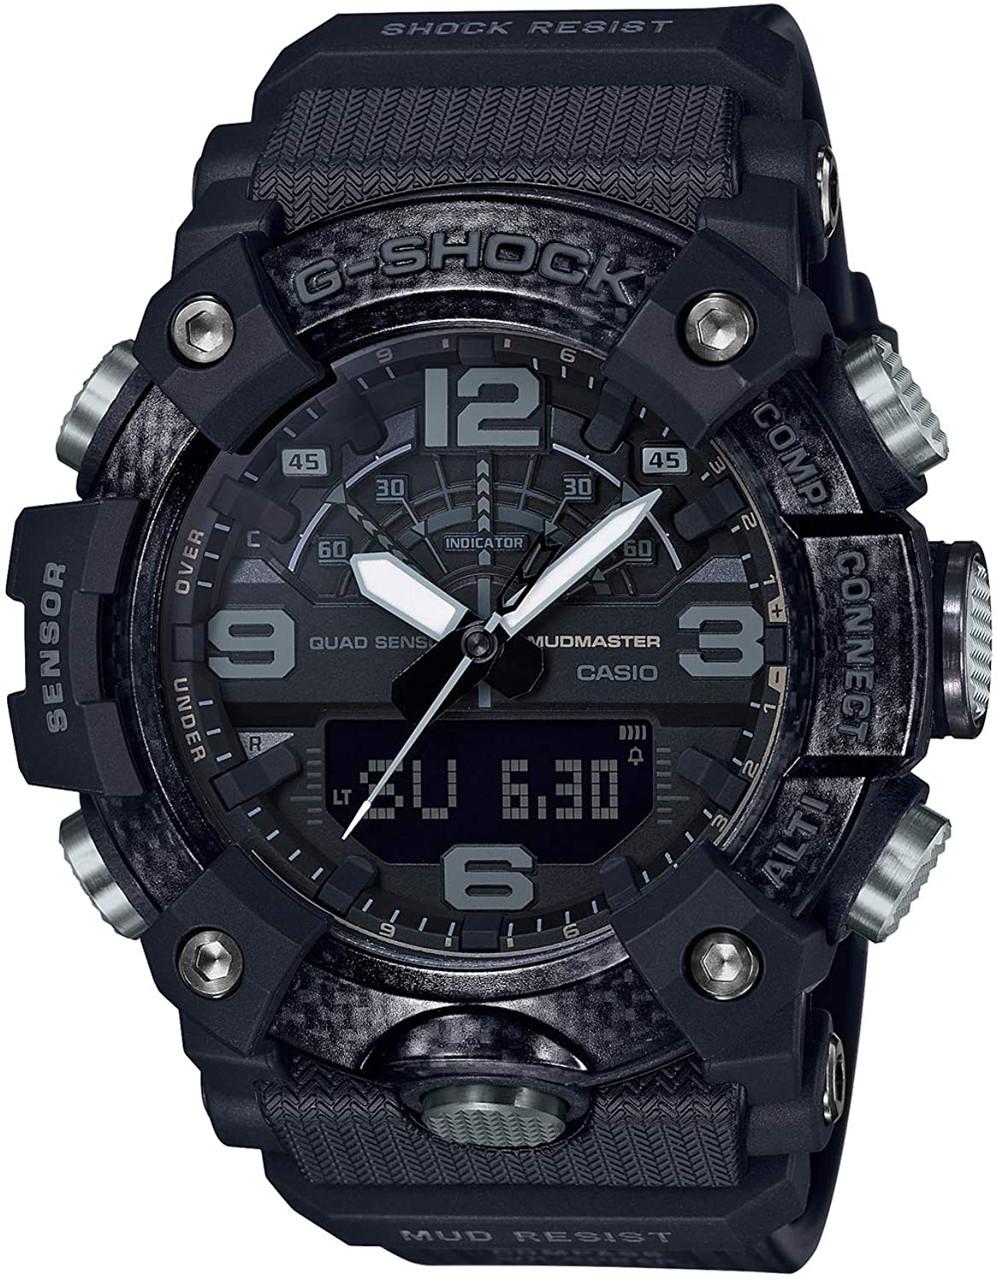 G-Shock Mudmaster Black Out GG-B100-1BJF